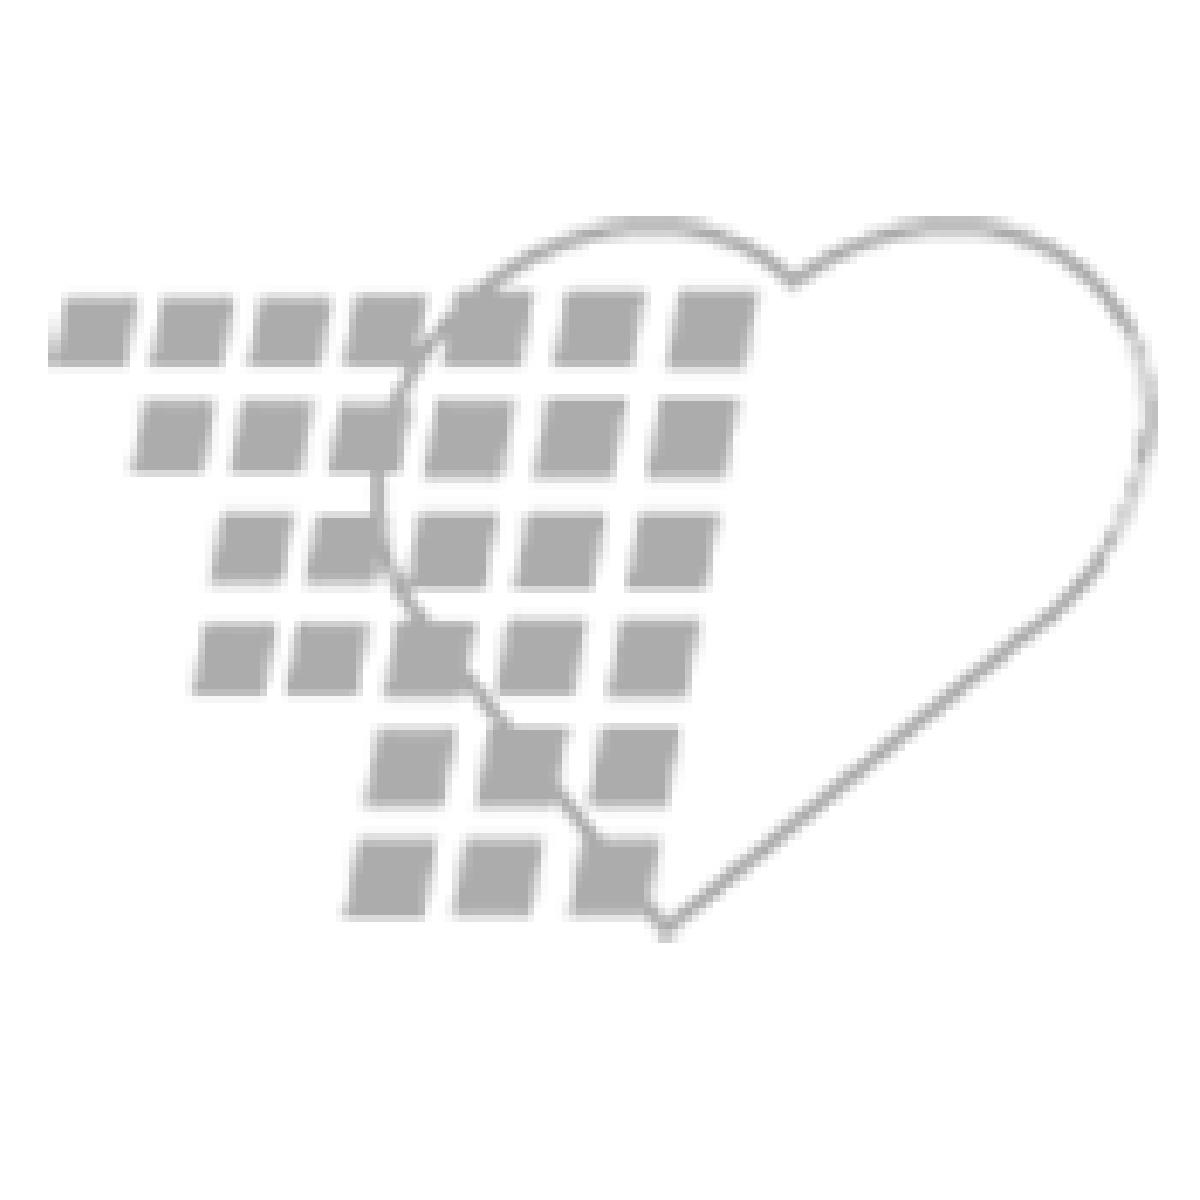 05-76-2200 ErgoSheet® 2200 56 x 32 Inch